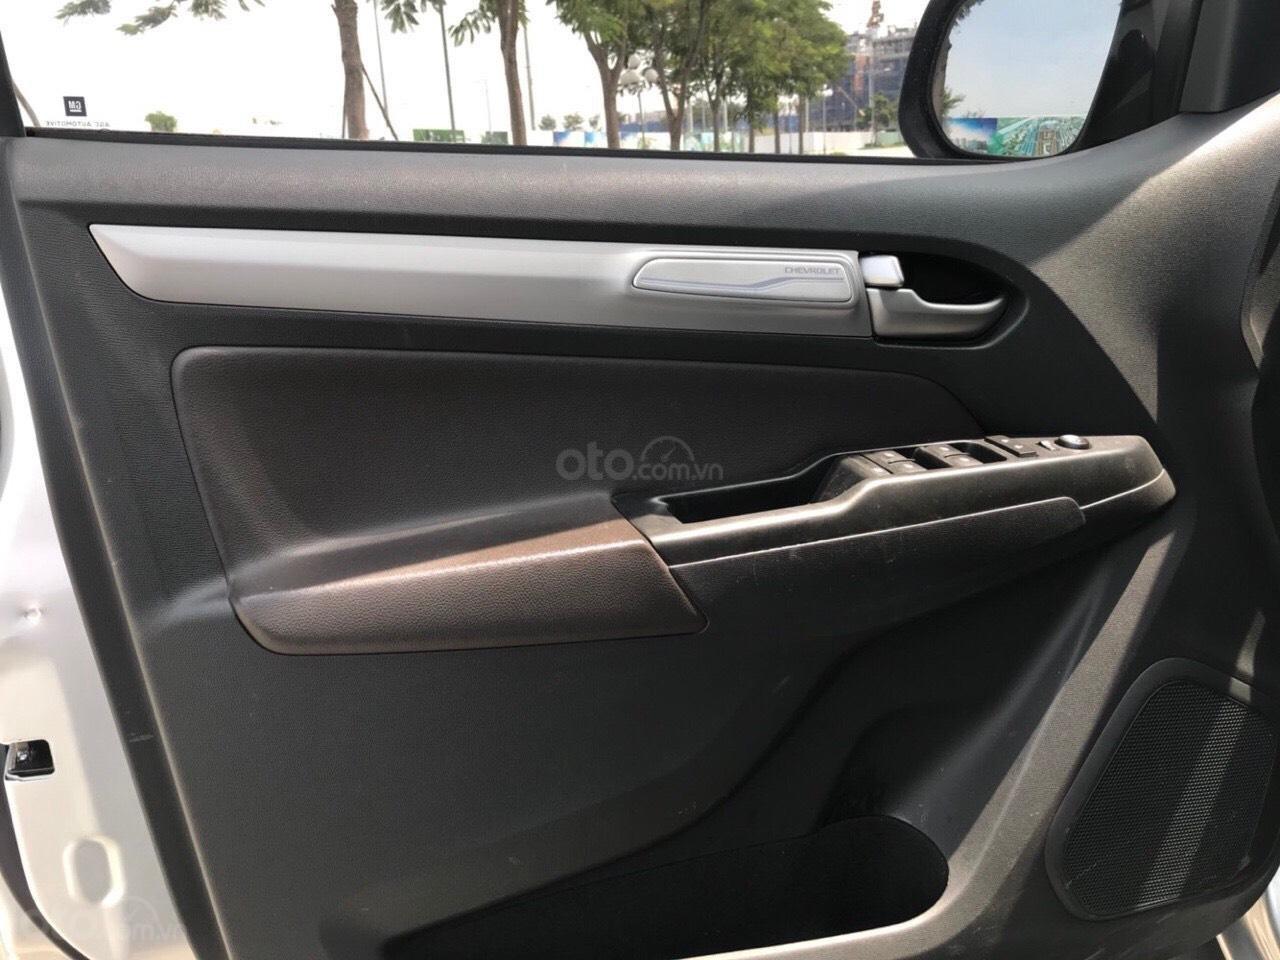 Bán xe Chevrolet Trailblazer Premium 2018 (3)